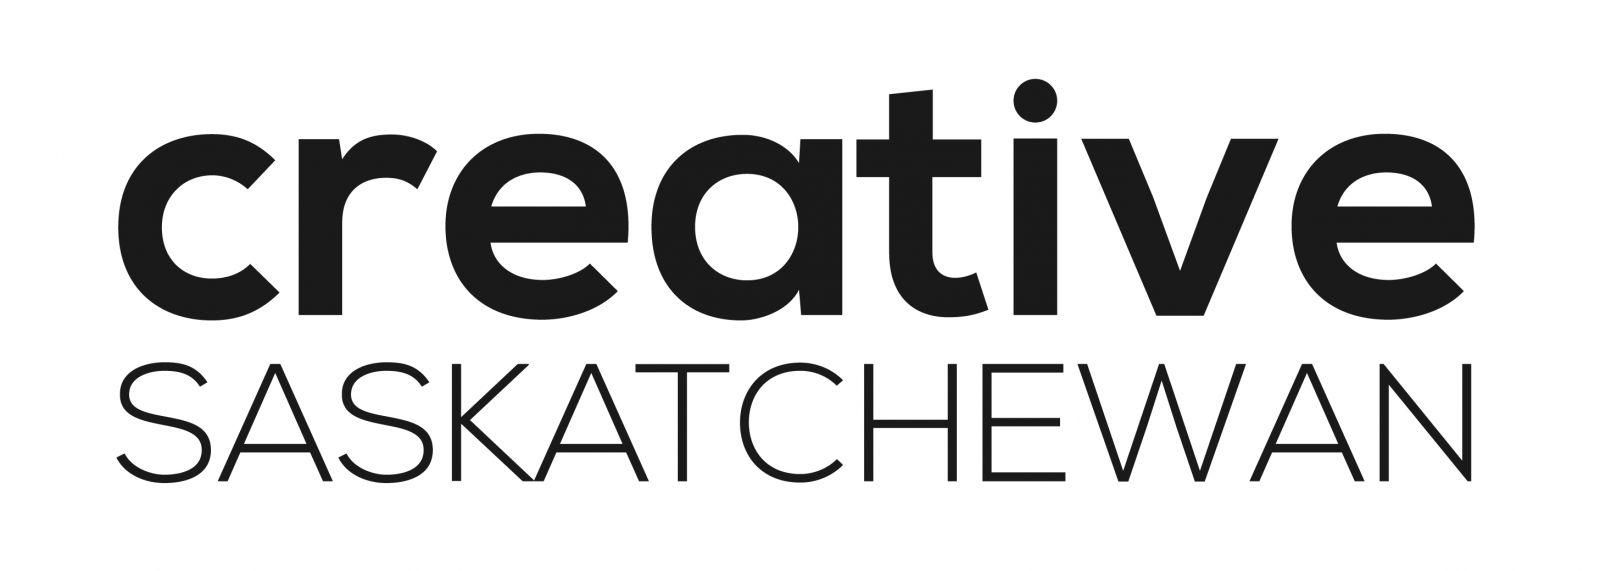 creativesask-hires-01.jpg